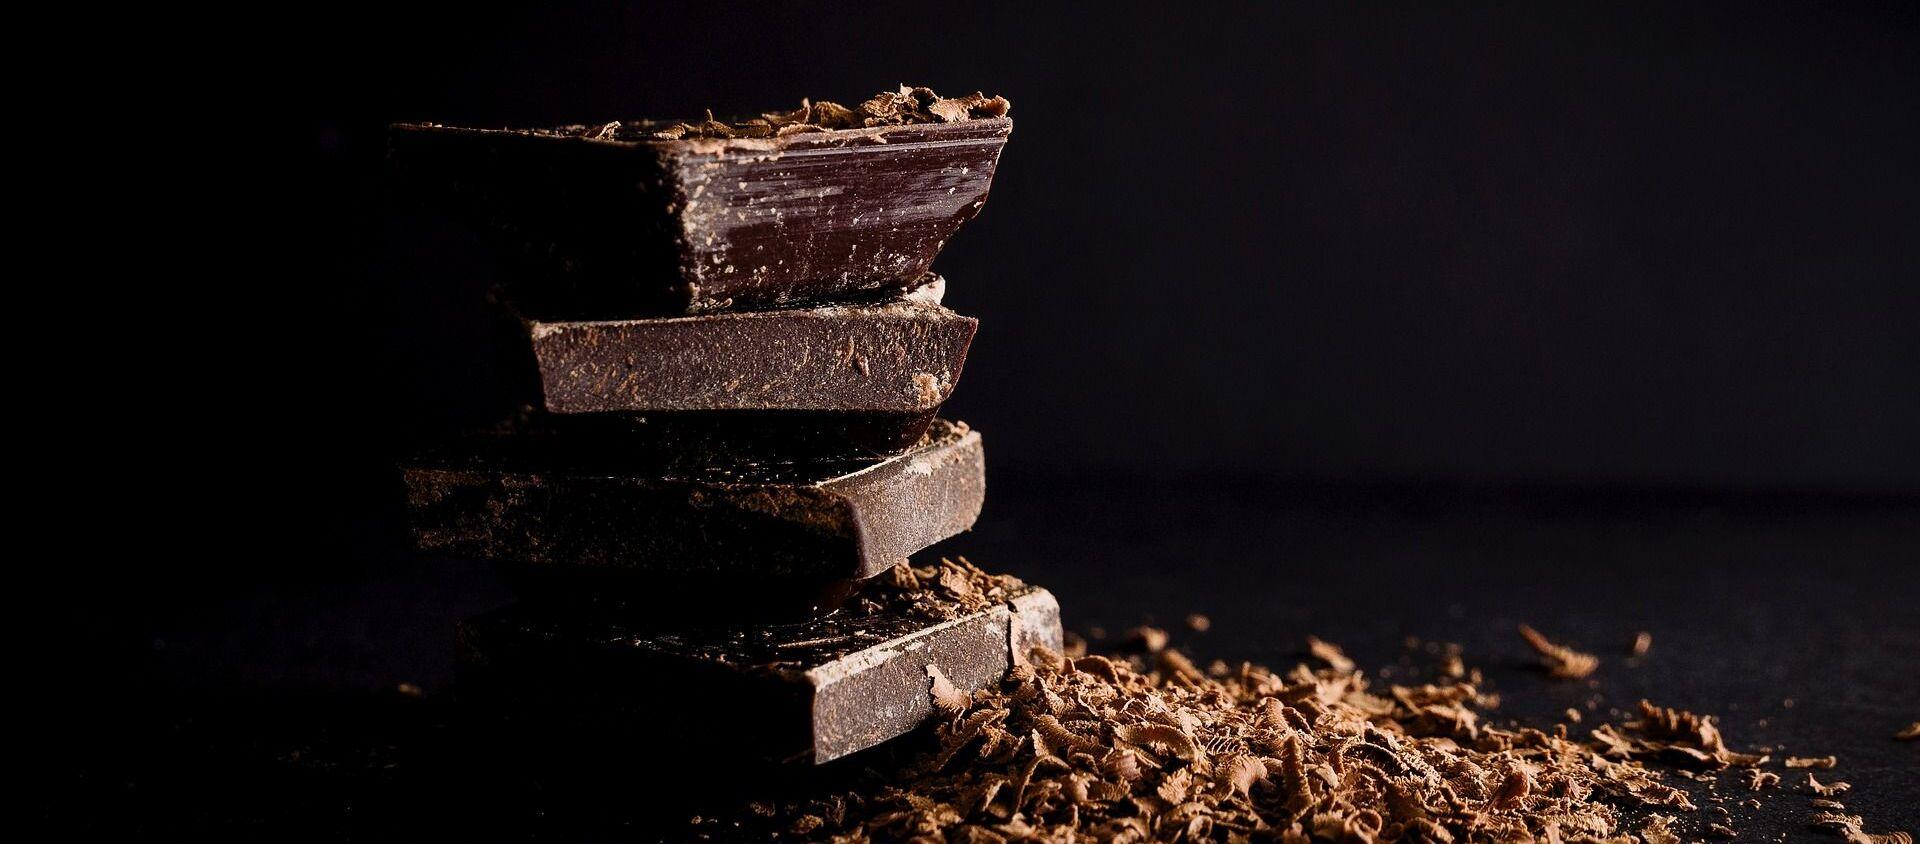 Du chocolat noir - Sputnik France, 1920, 18.08.2021